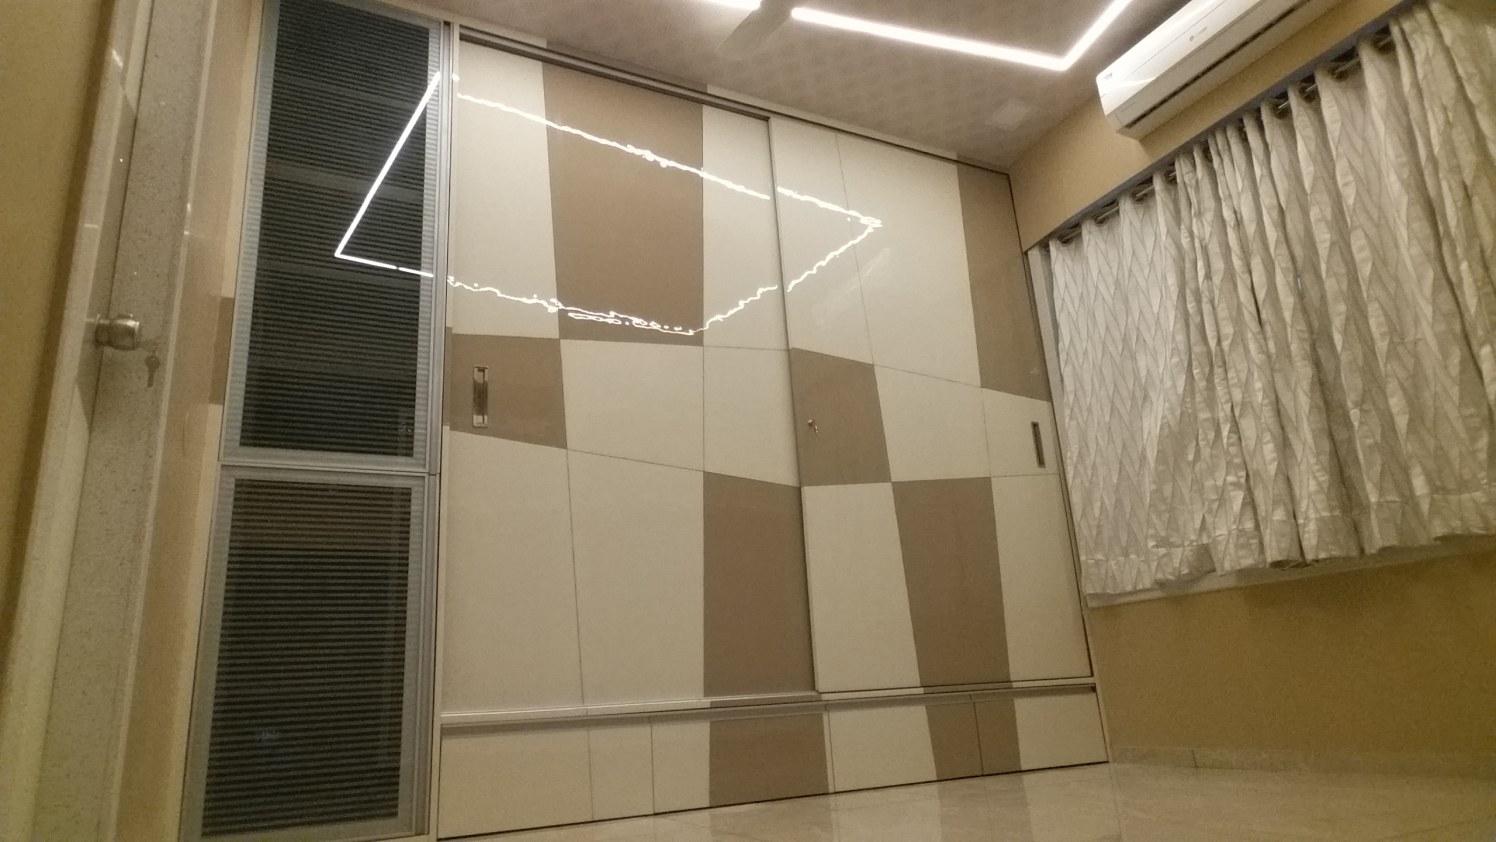 Bedroom Wardrobe by Alaya D'decor  Bedroom Modern | Interior Design Photos & Ideas